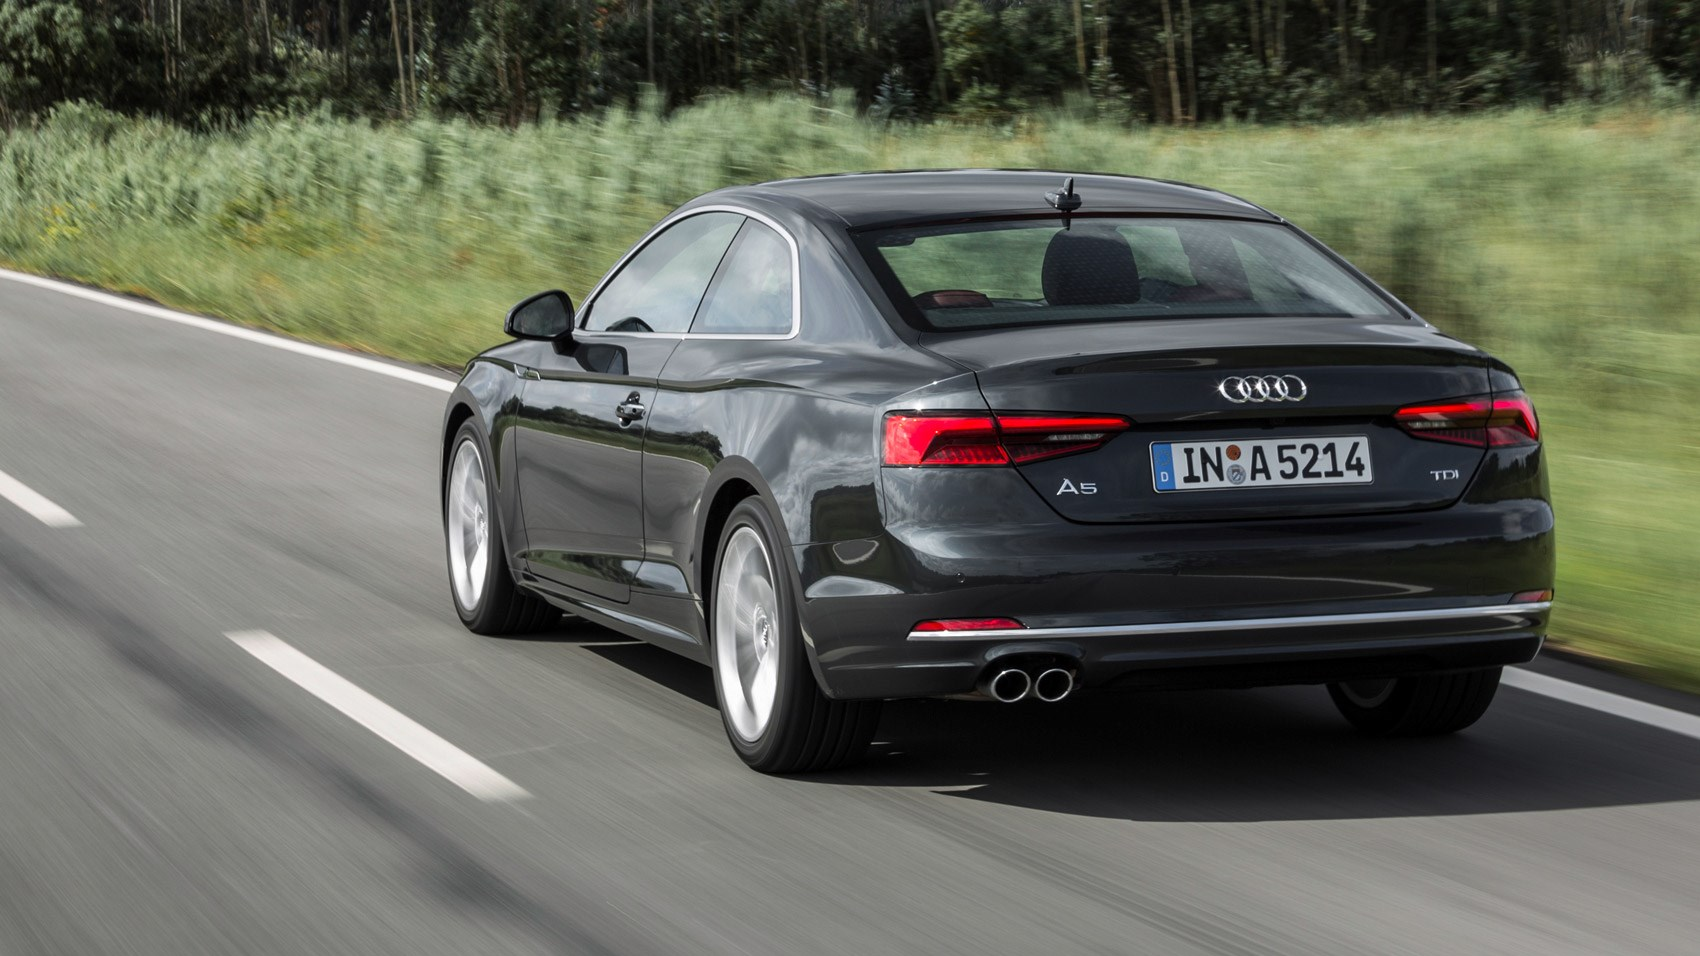 Audi A5 2 0 Tdi 190 Coupe 2016 Review Car Magazine